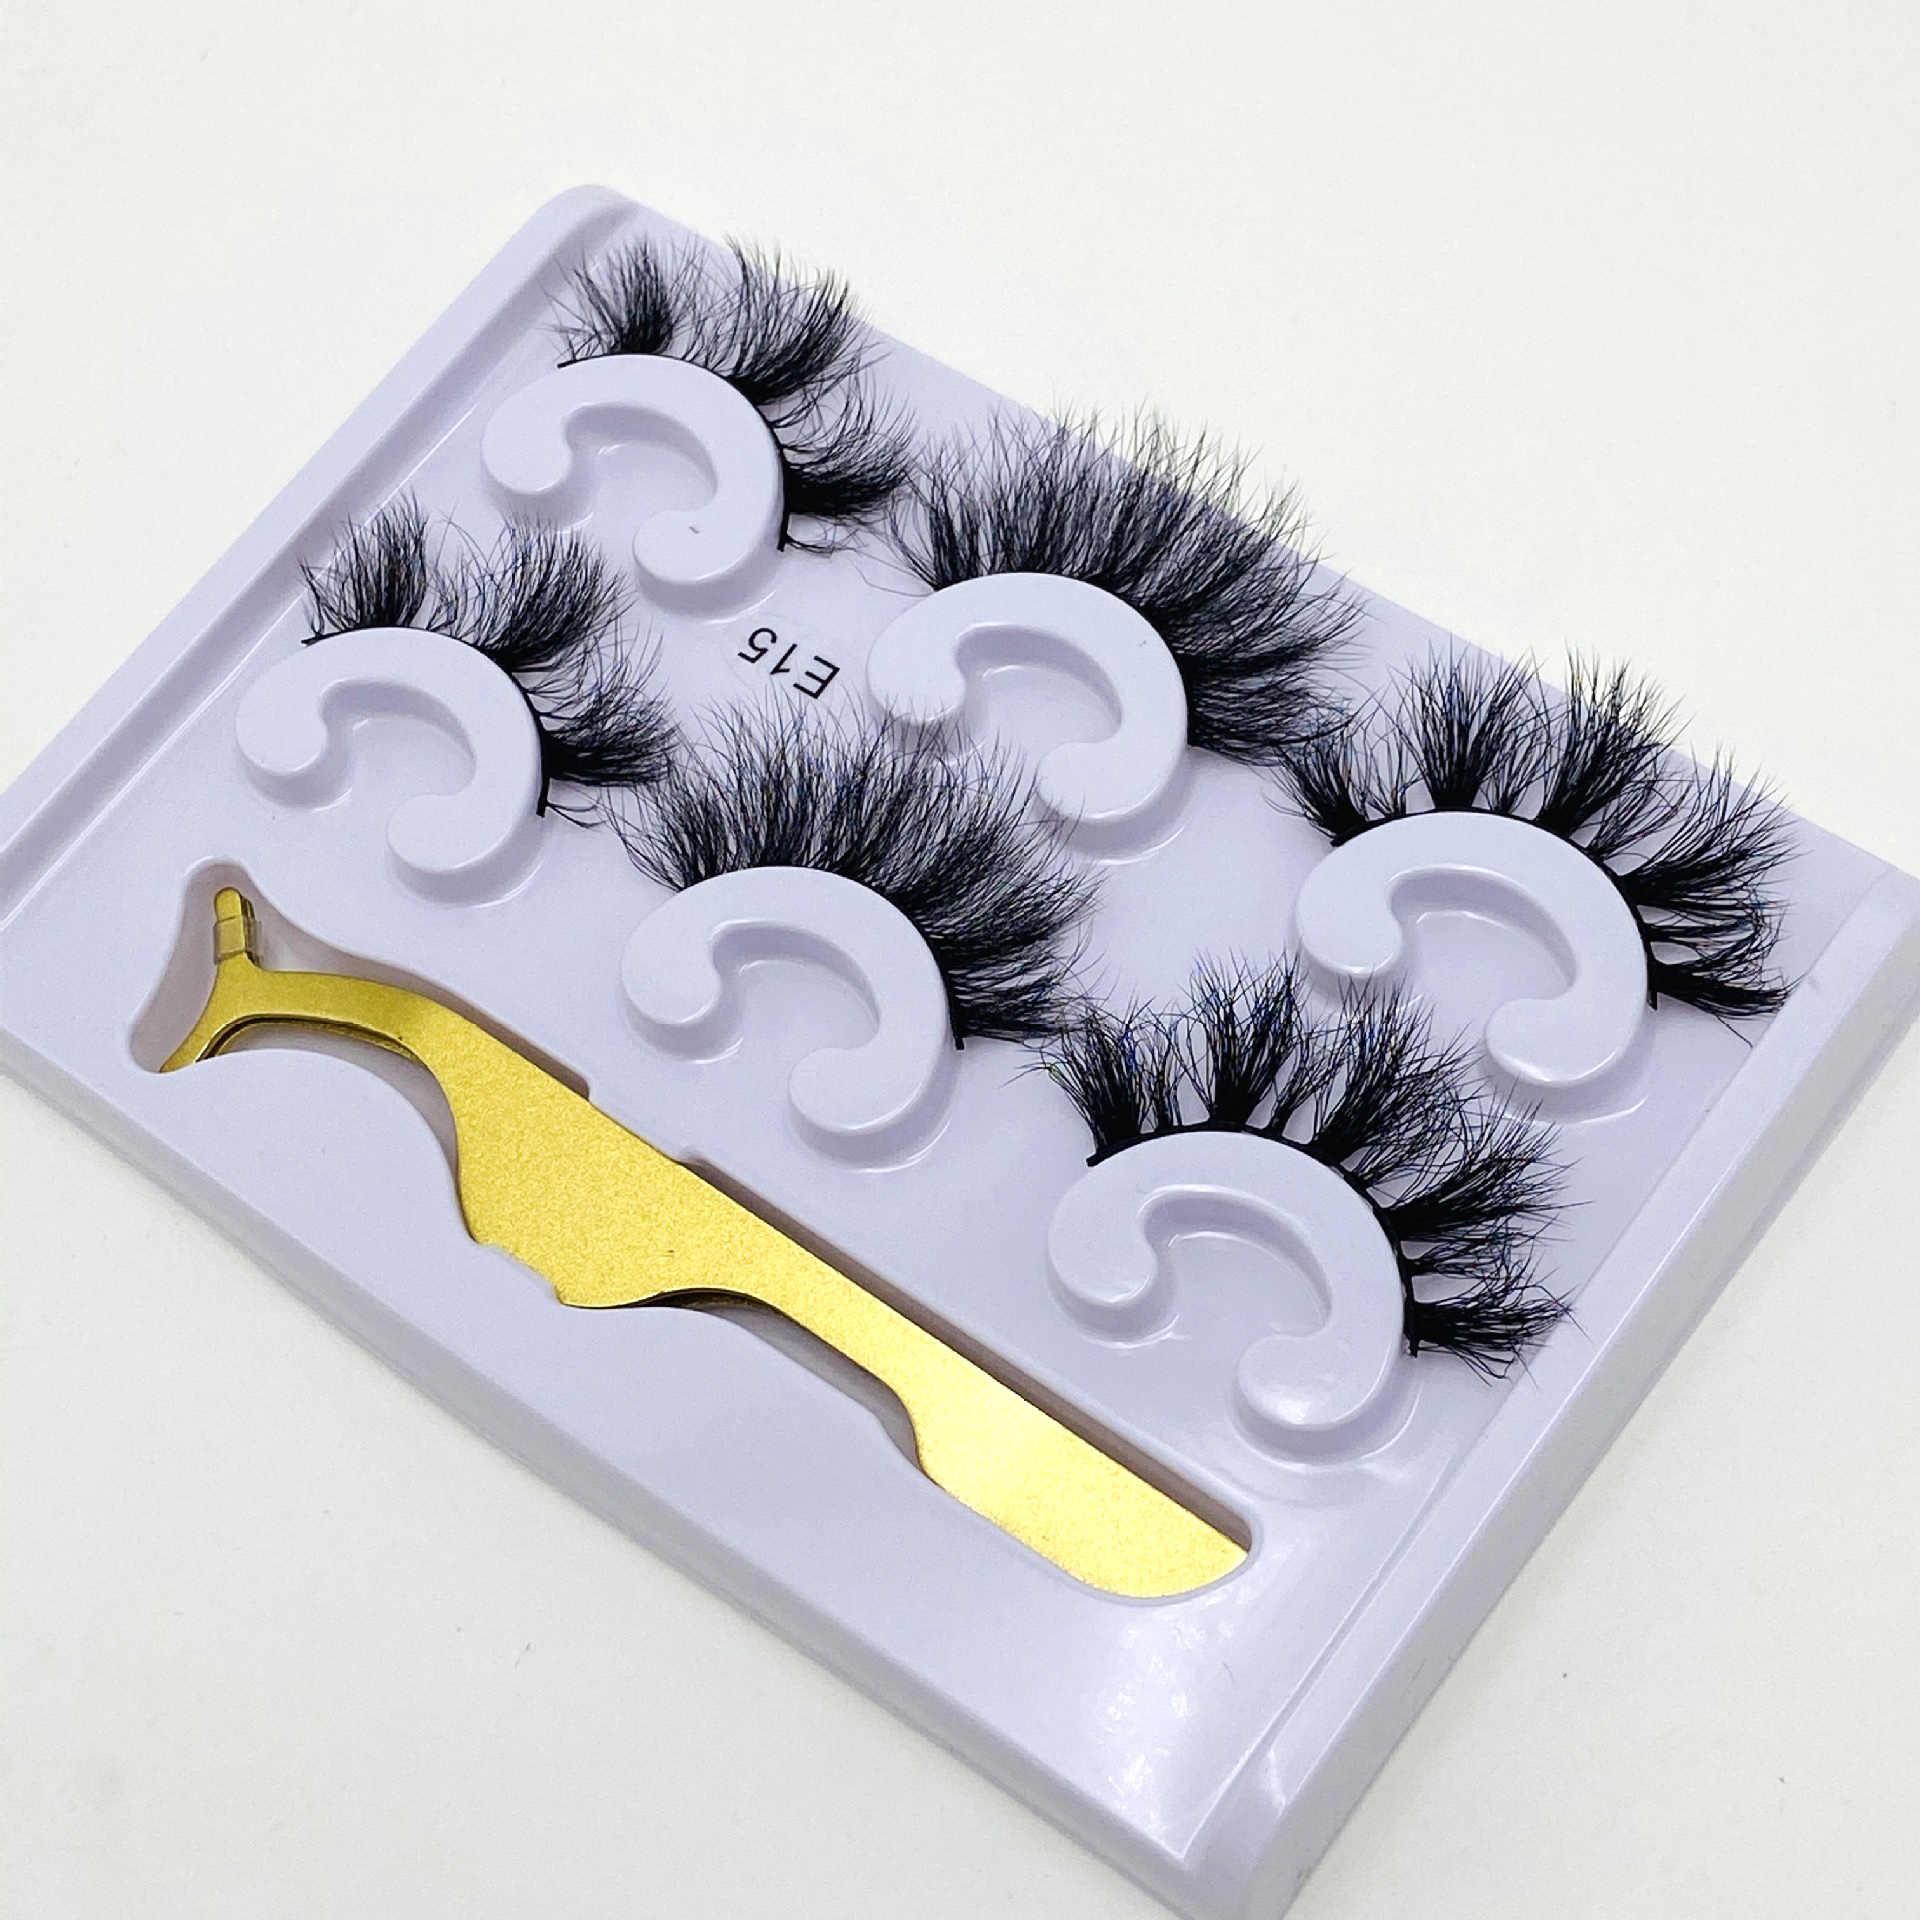 3pair Pack Fluffy Lashes 25mm 3d Mink Lashes Long Thick Natural False Eyelashes Wholesale Lashes Vendors Makeup Mink Eyelashes Aliexpress